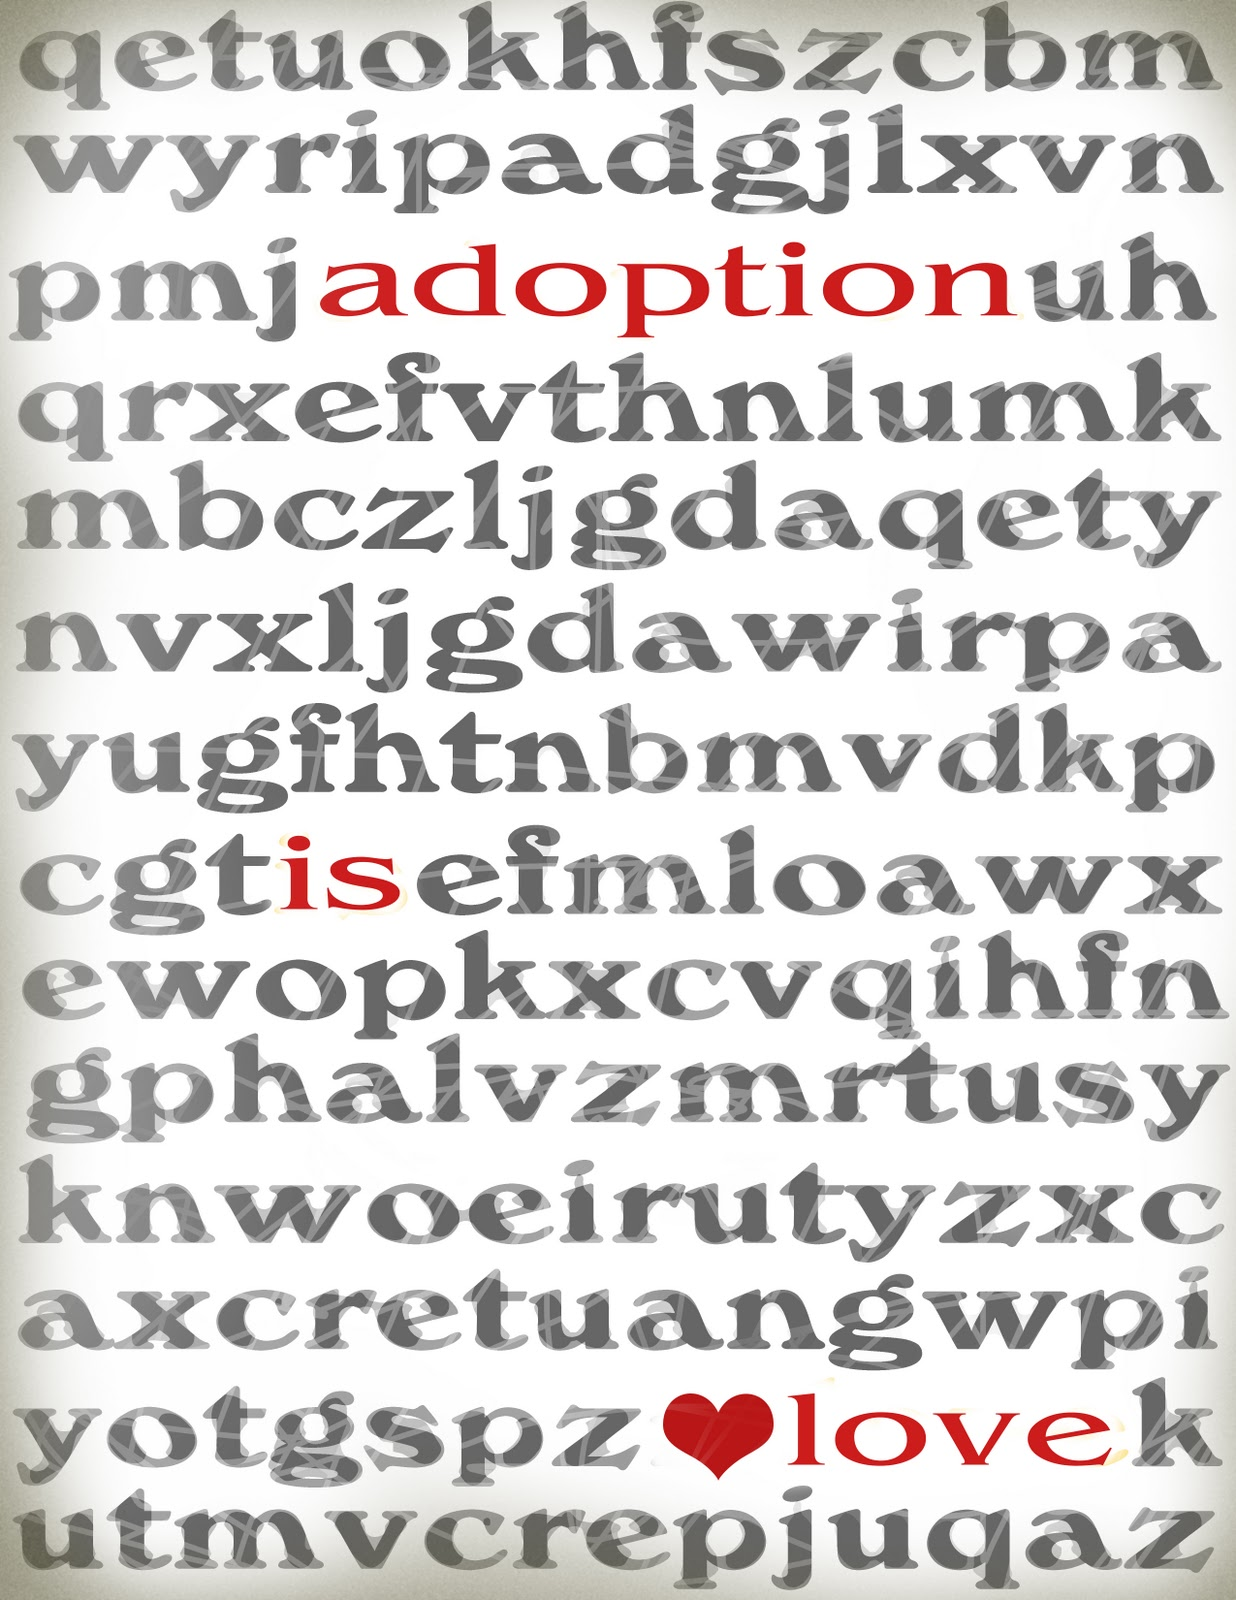 Adoption Quotes Adoption Art  Darling Doodles